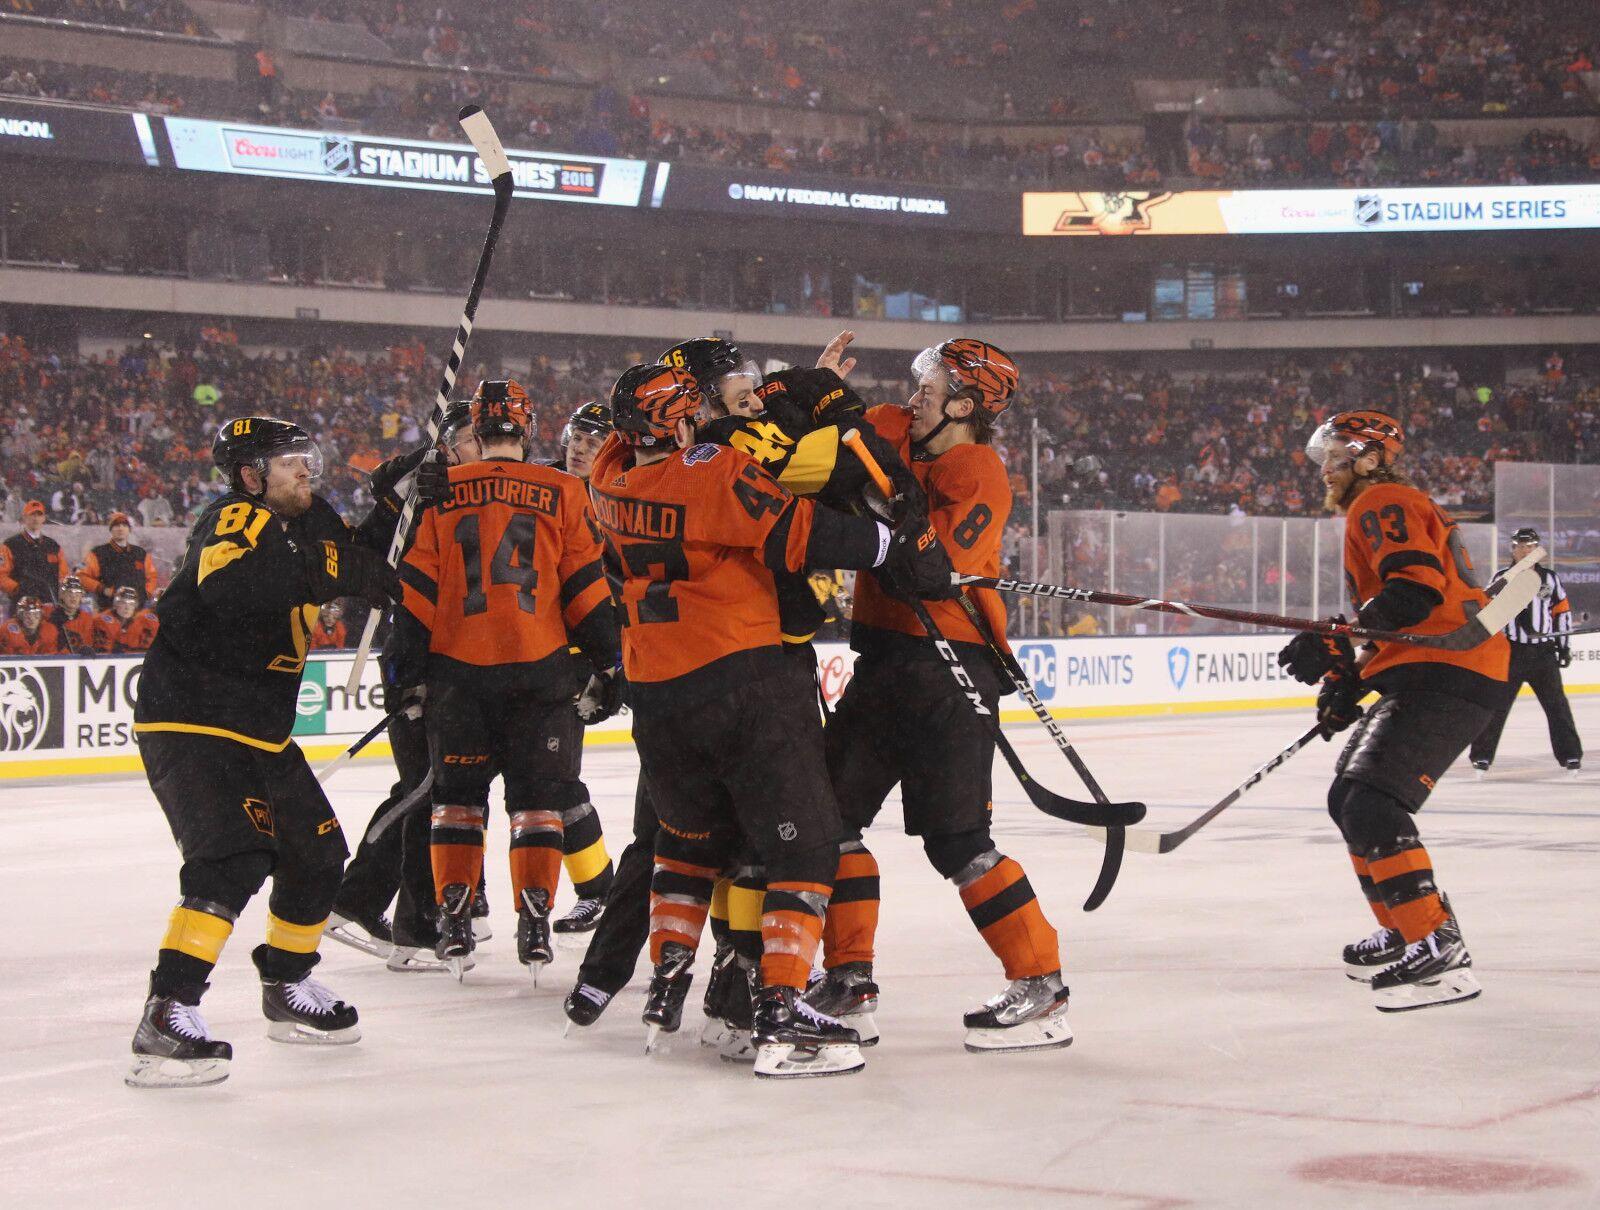 online retailer c9f1b b2b21 Philadelphia Flyers: Stadium Series overtime win was amazing ...